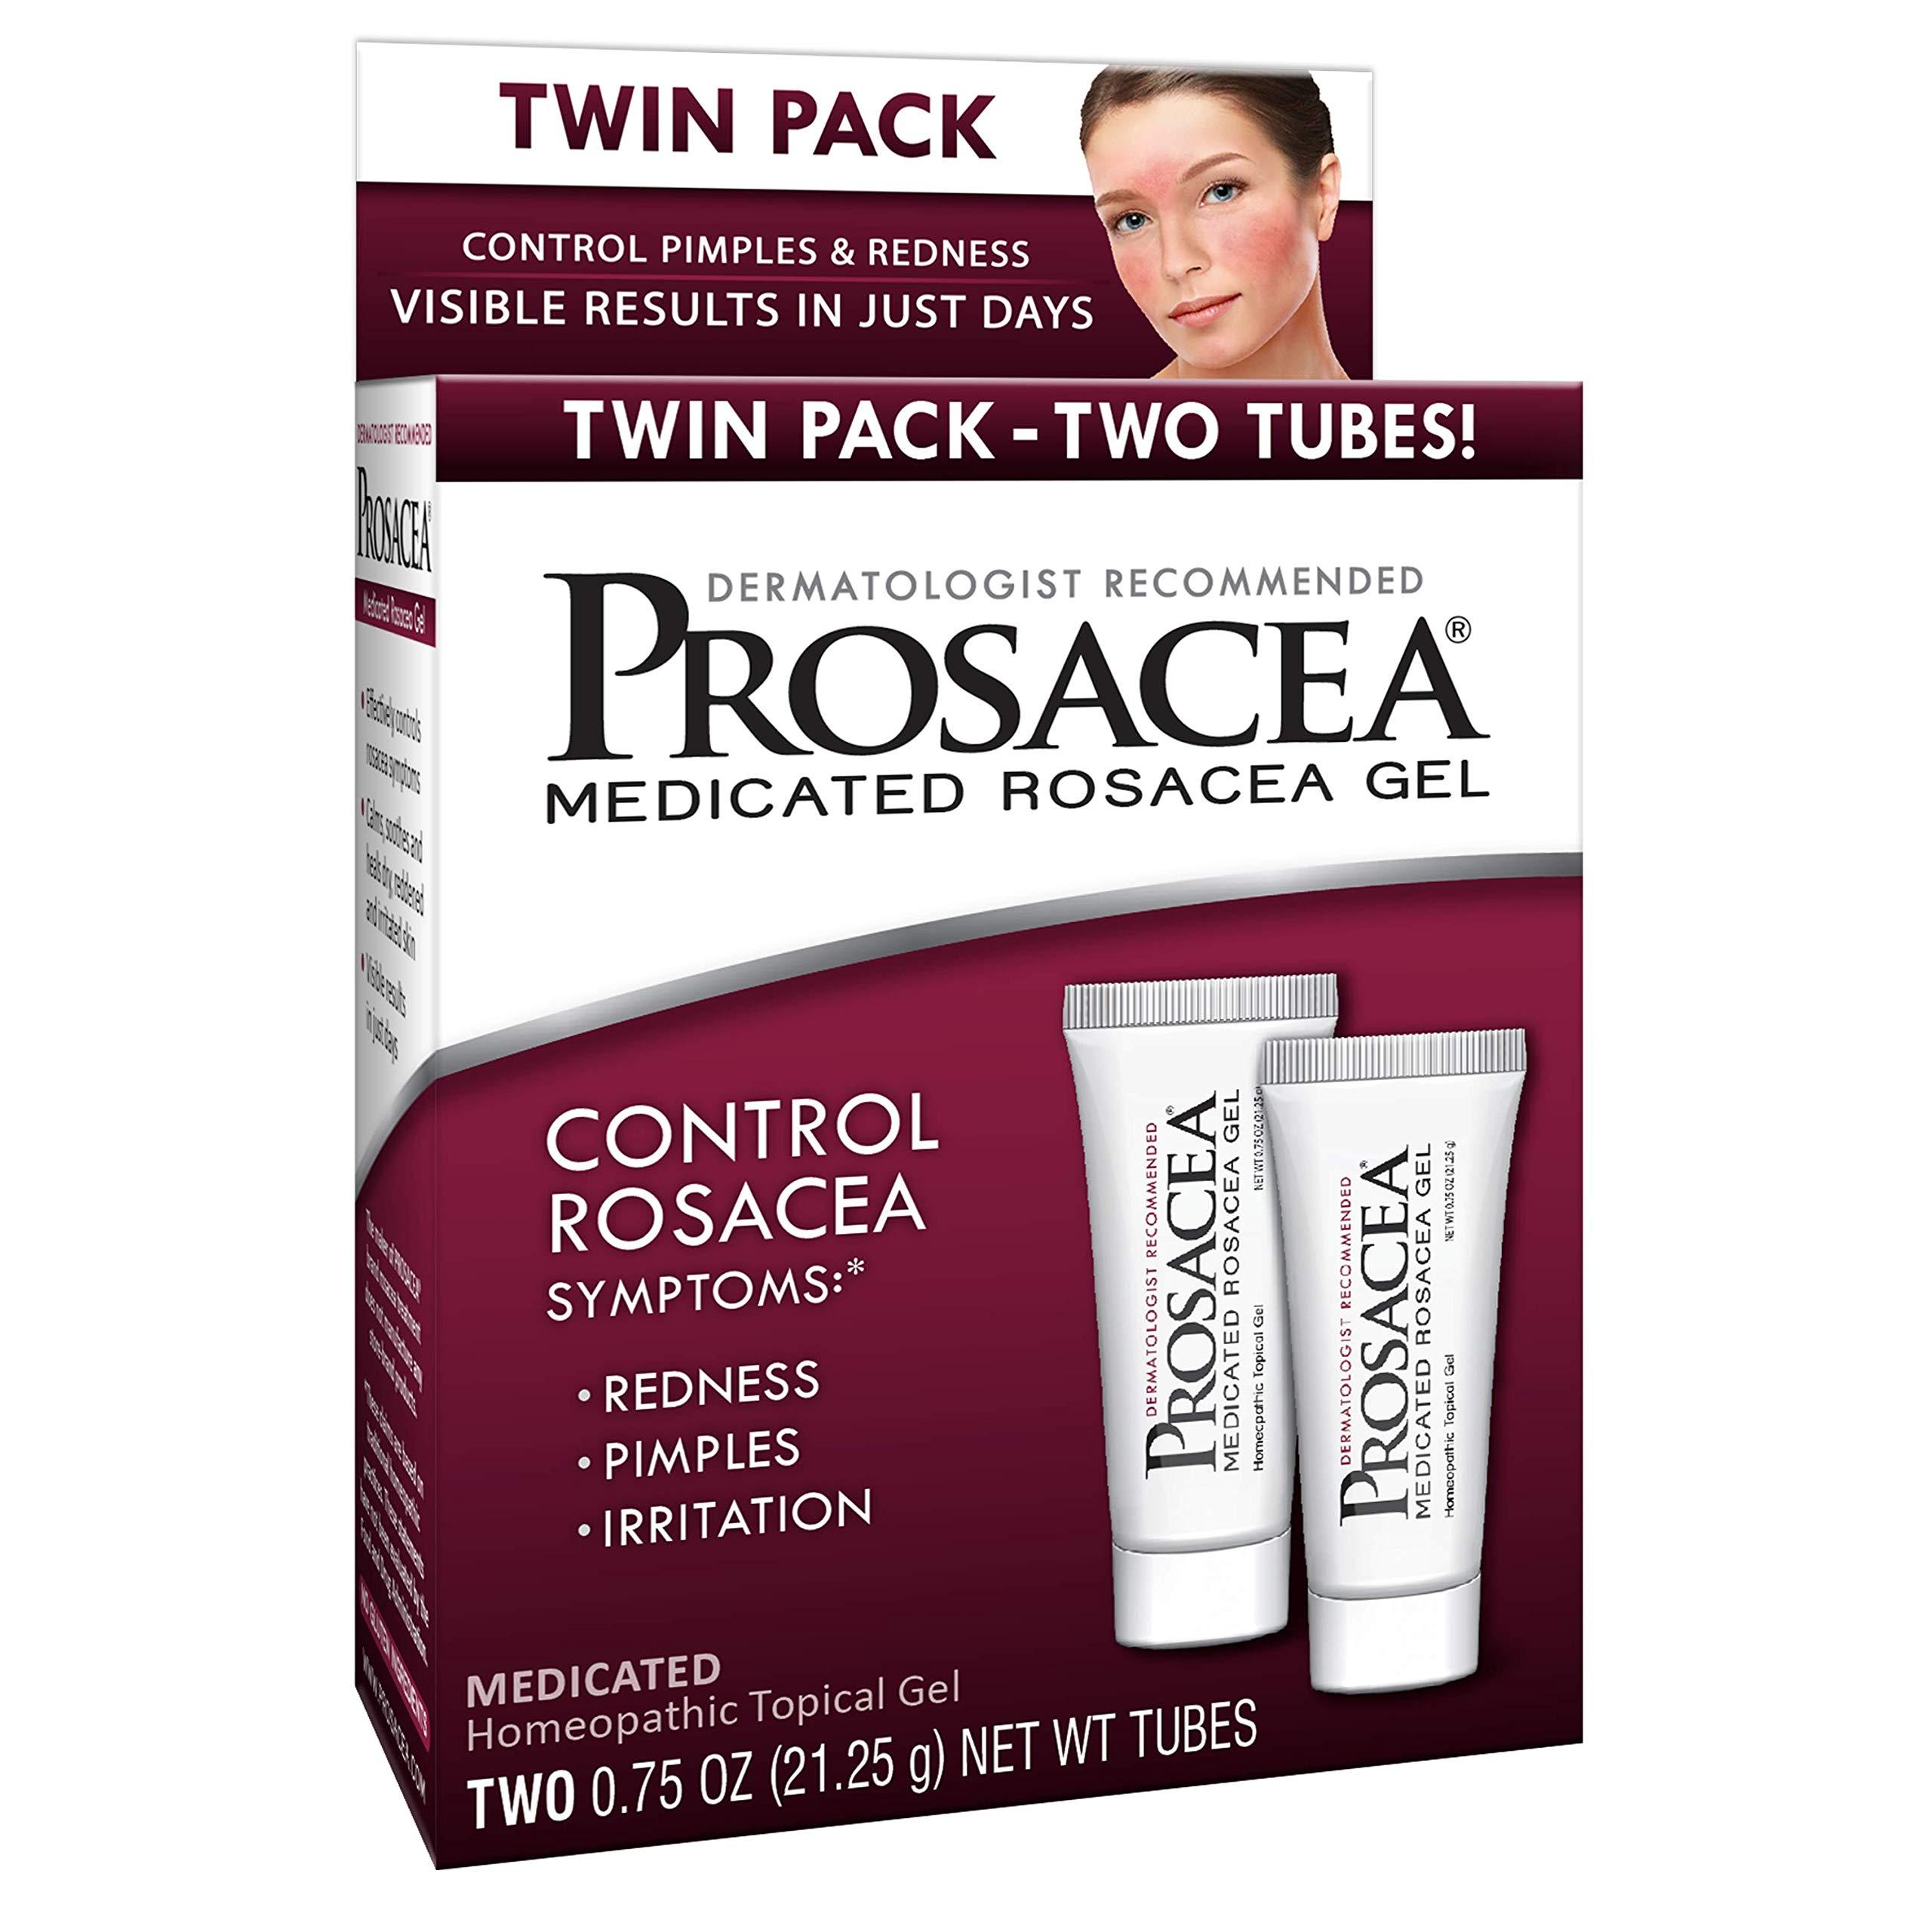 Prosacea Controls Maskne Rosacea Symptoms Redness Pimples Irritation (Twin Pack) Two 0.75oz Tubes oz (Total 1.5 Ounce)